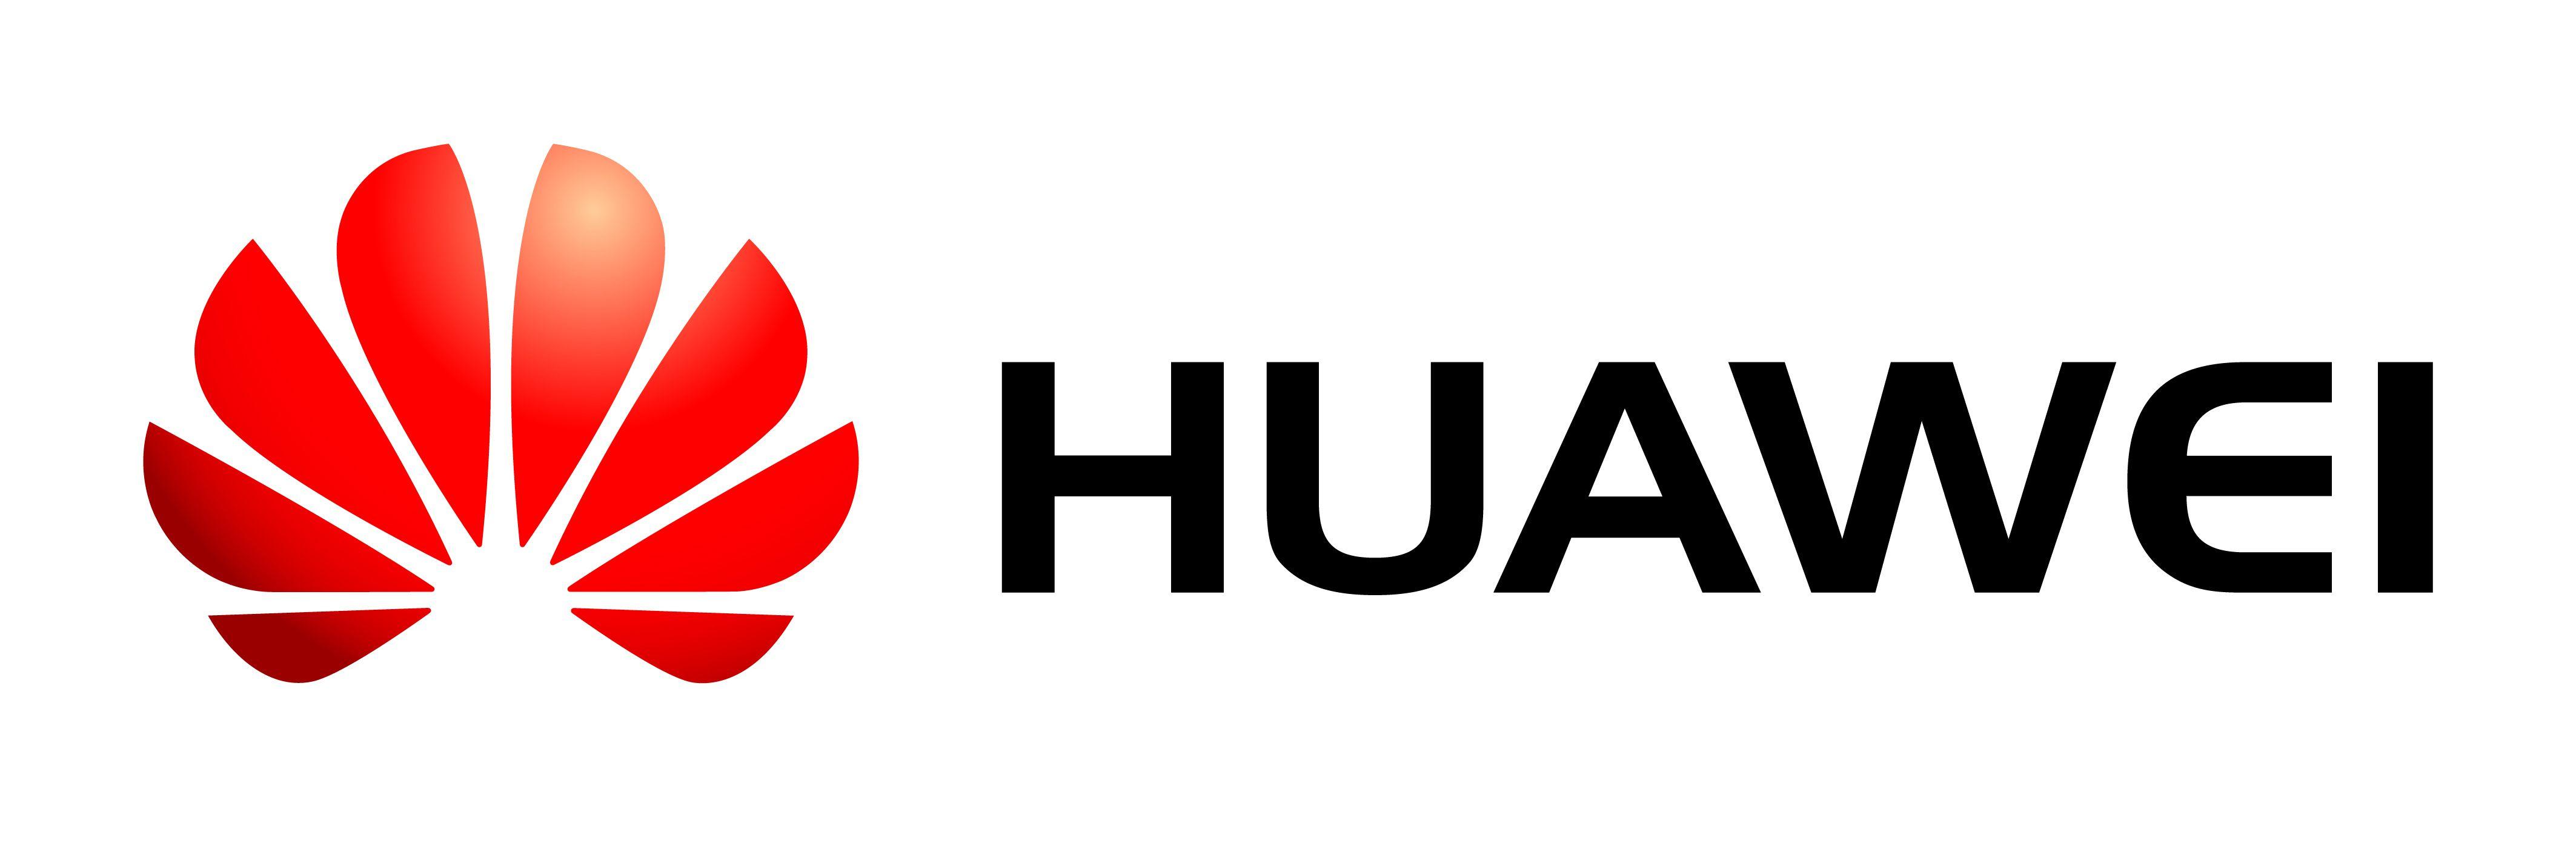 38317 Telecom CP FIP Tunisie Huawei 240619 copy copy